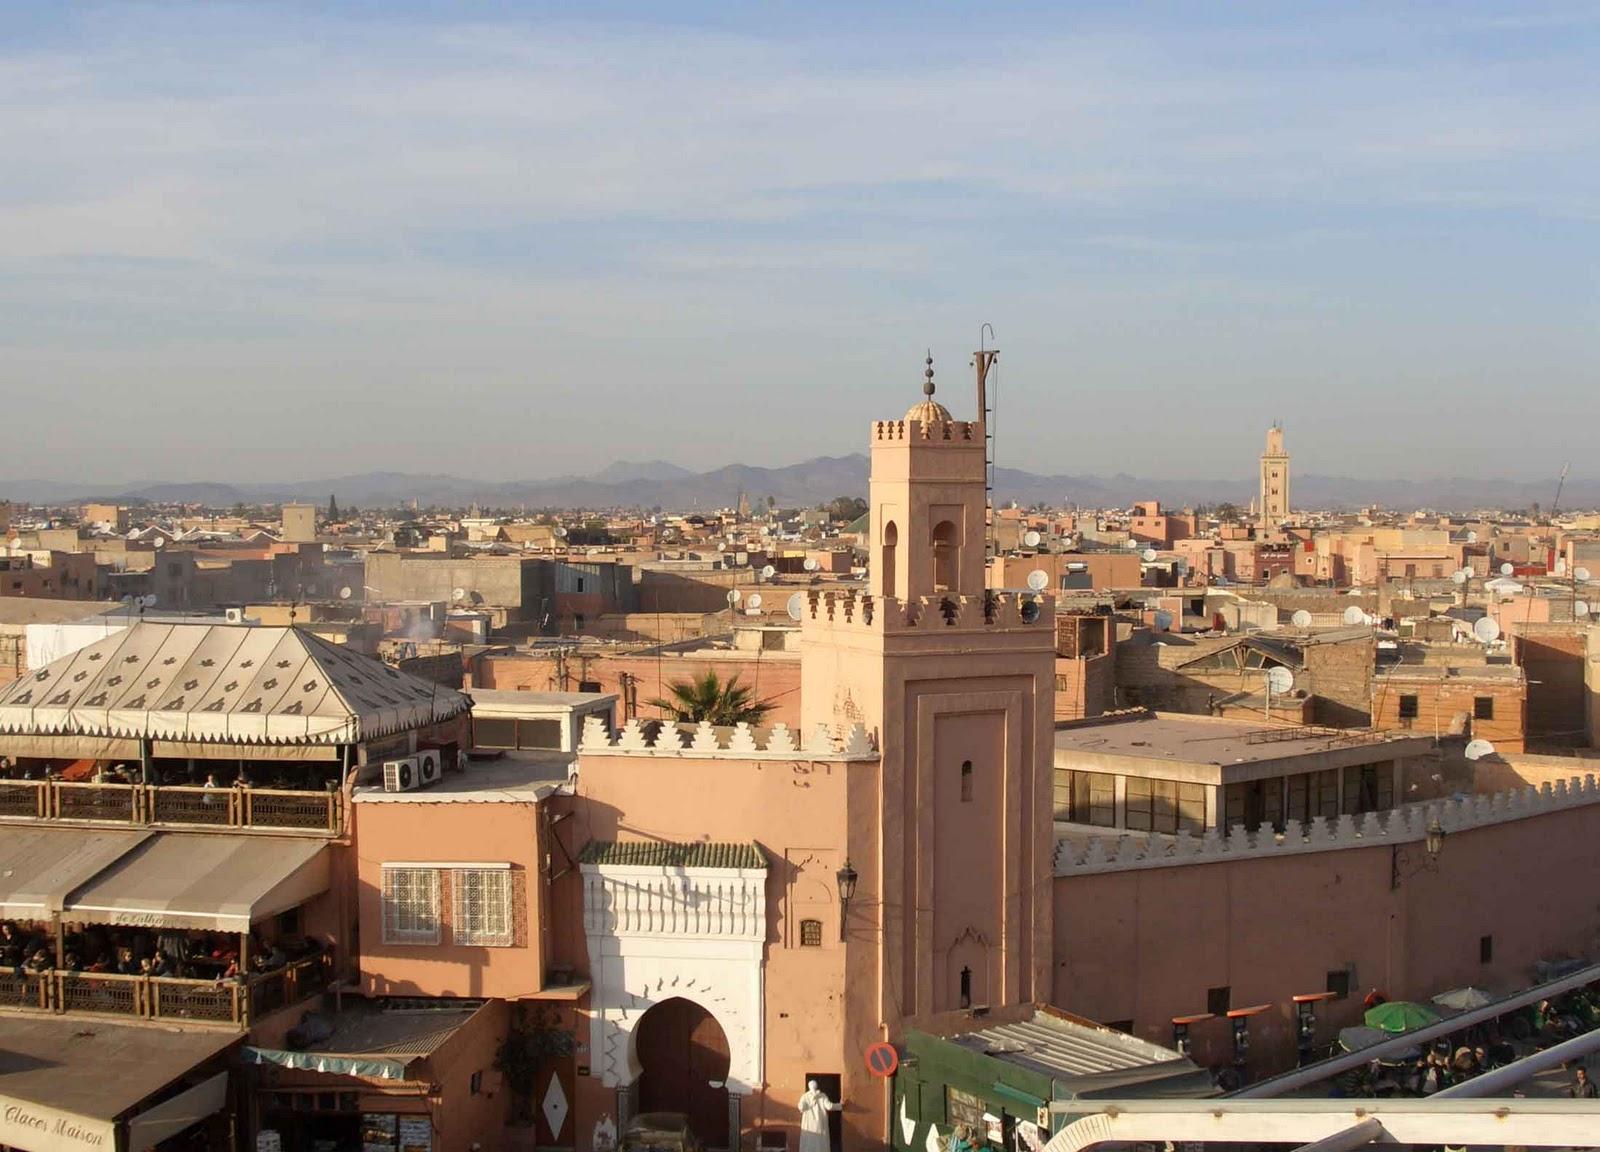 The Moroccan Gazetteer Portrait Of Marrakech The Old Medina